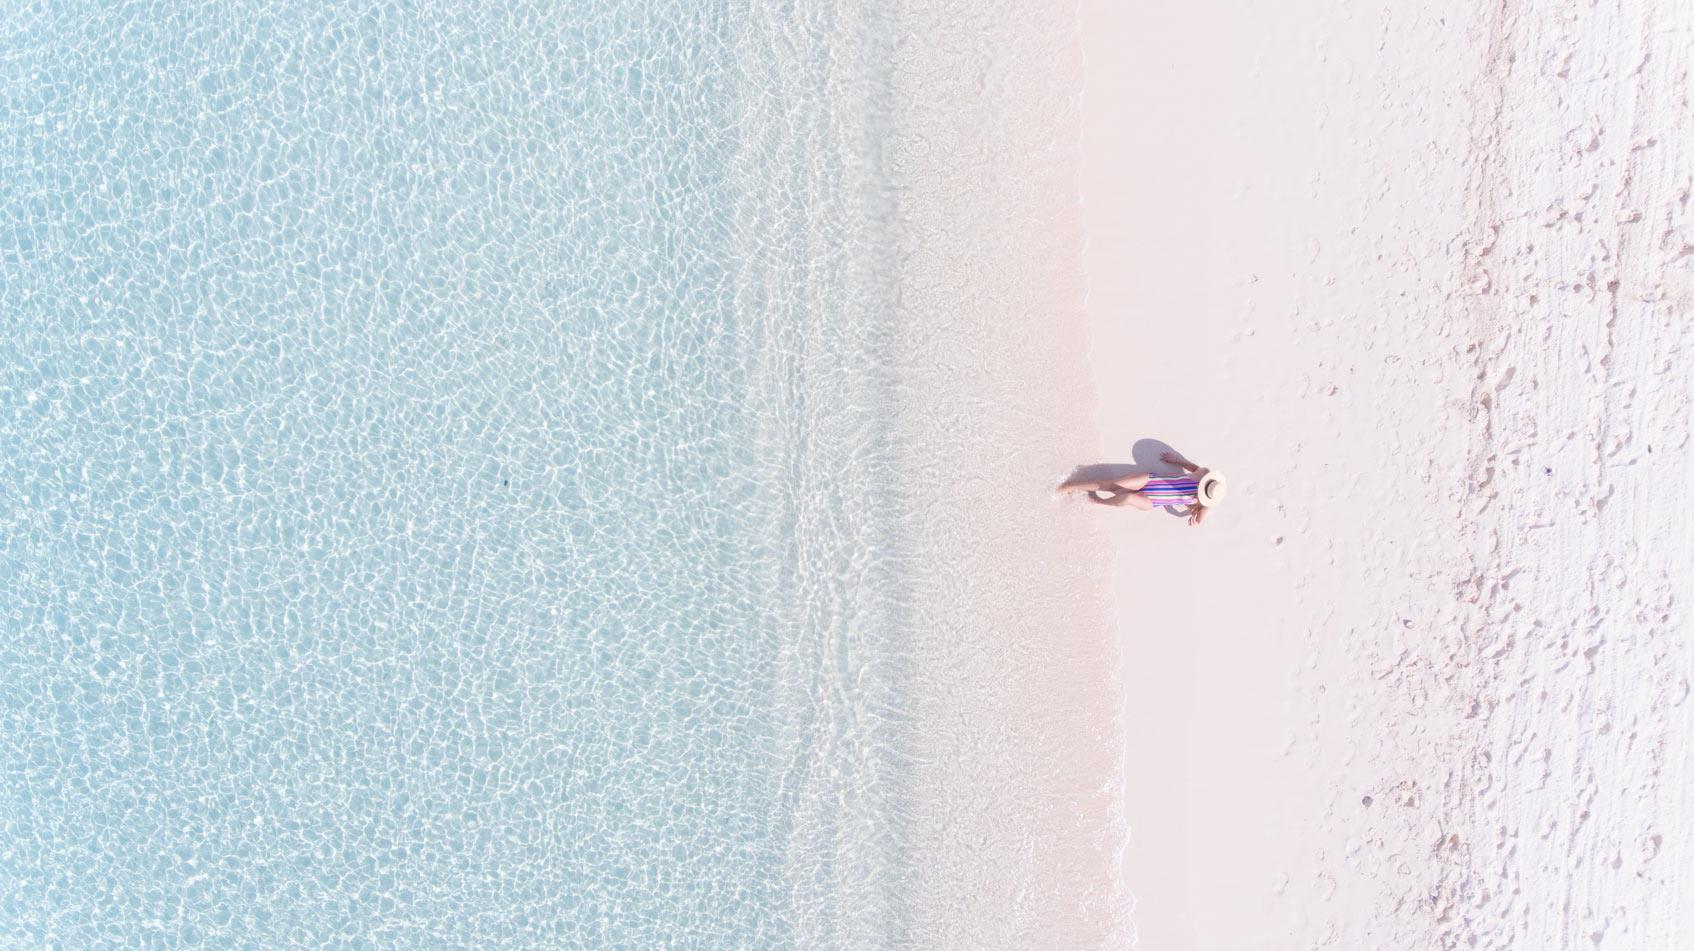 Увлажнение кожи на море